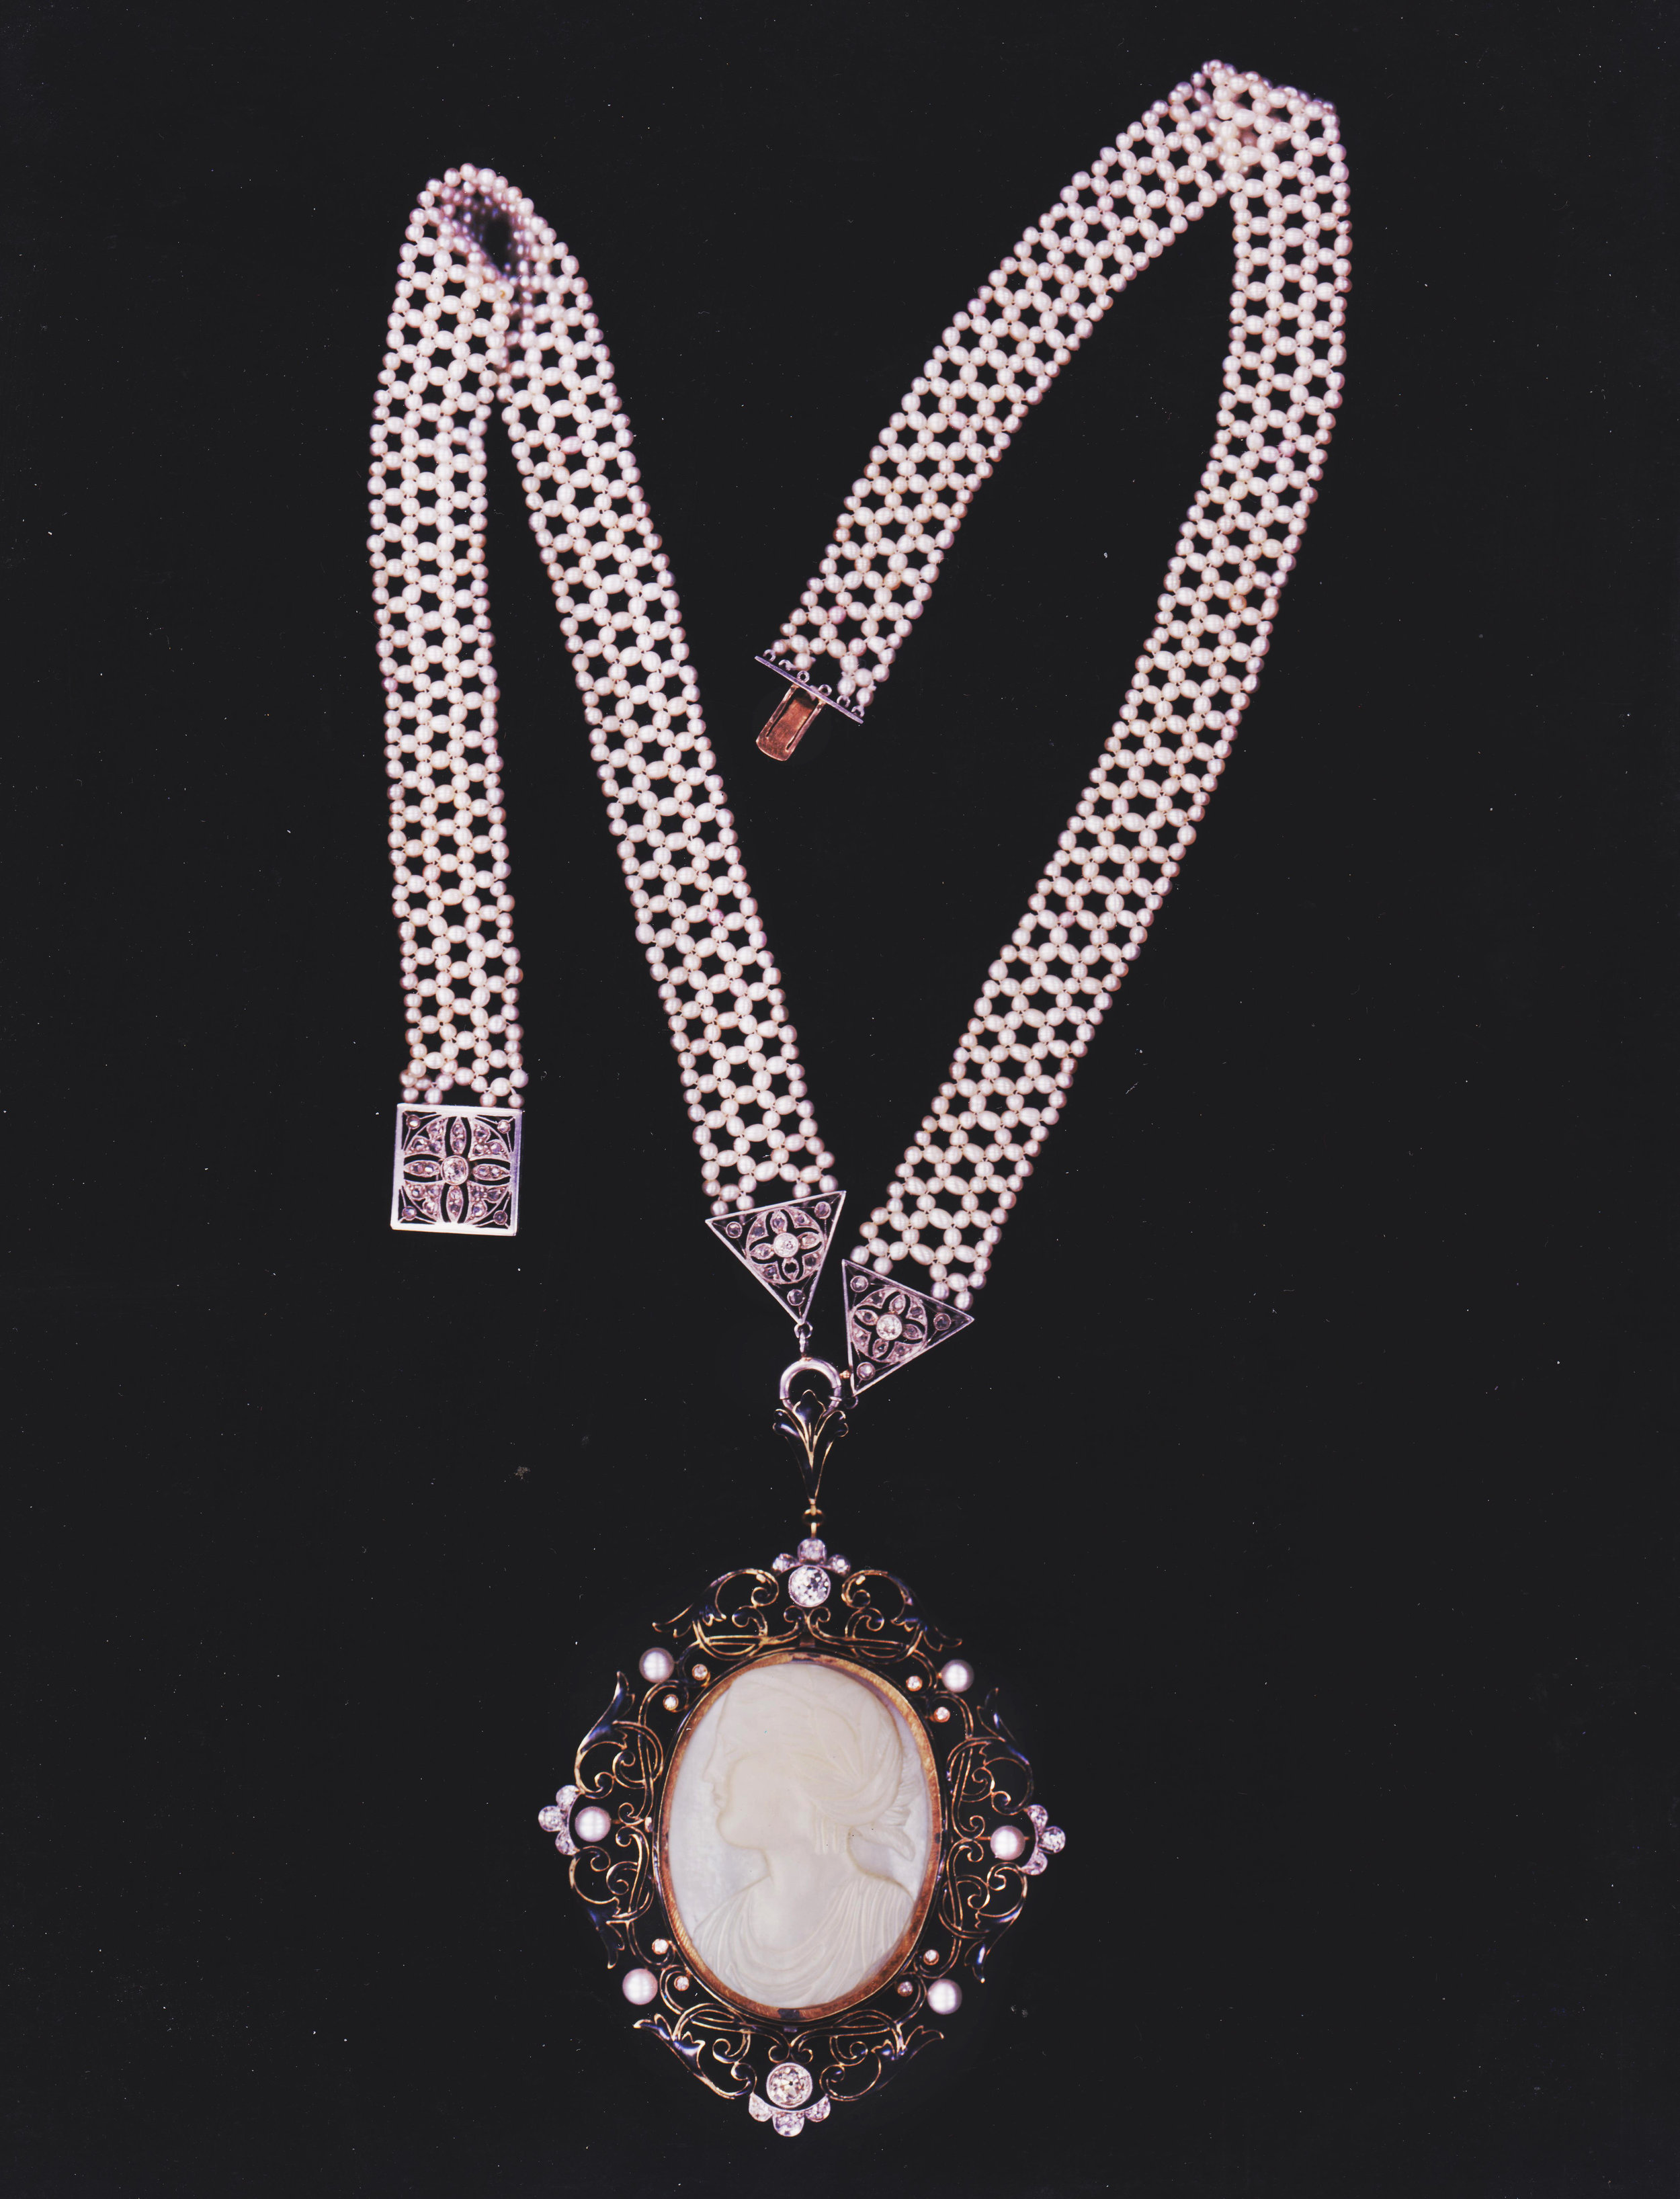 cameo necklace 2 001.jpg